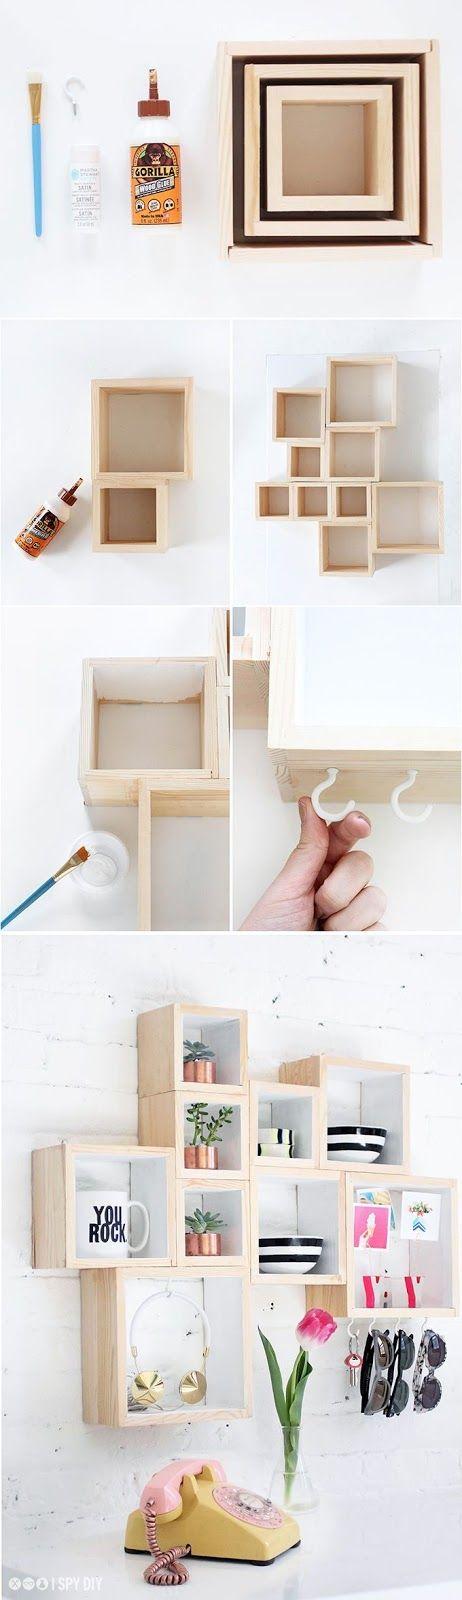 DIY estantes cúbicos